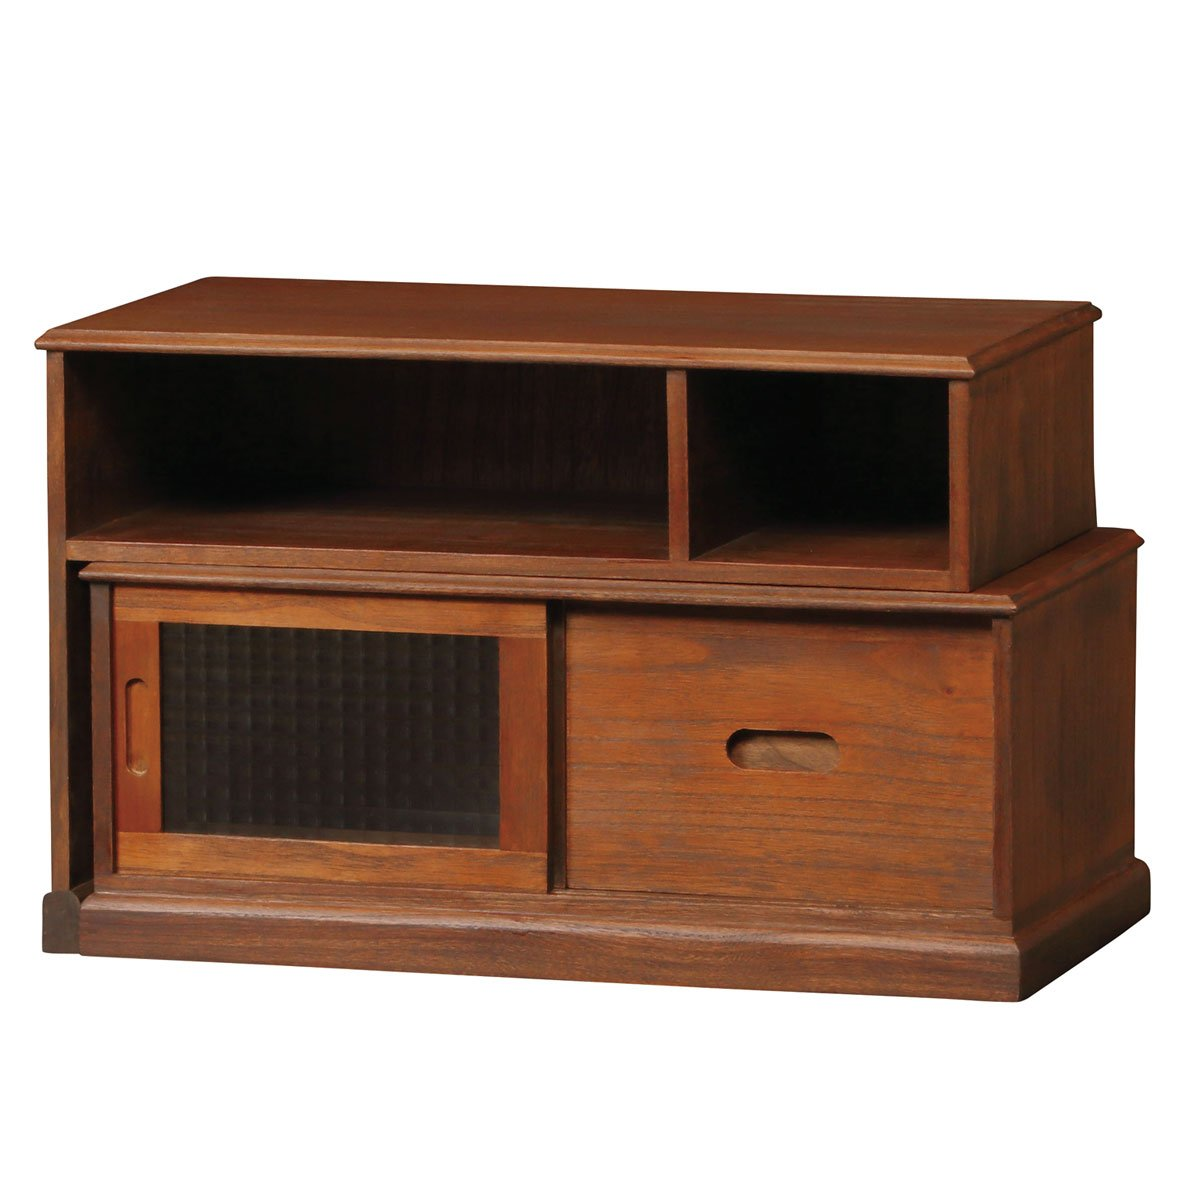 BEATON JAPAN スライド 文机 天然木 桐材 和室にぴったり コワンシリーズ B073JMRR36